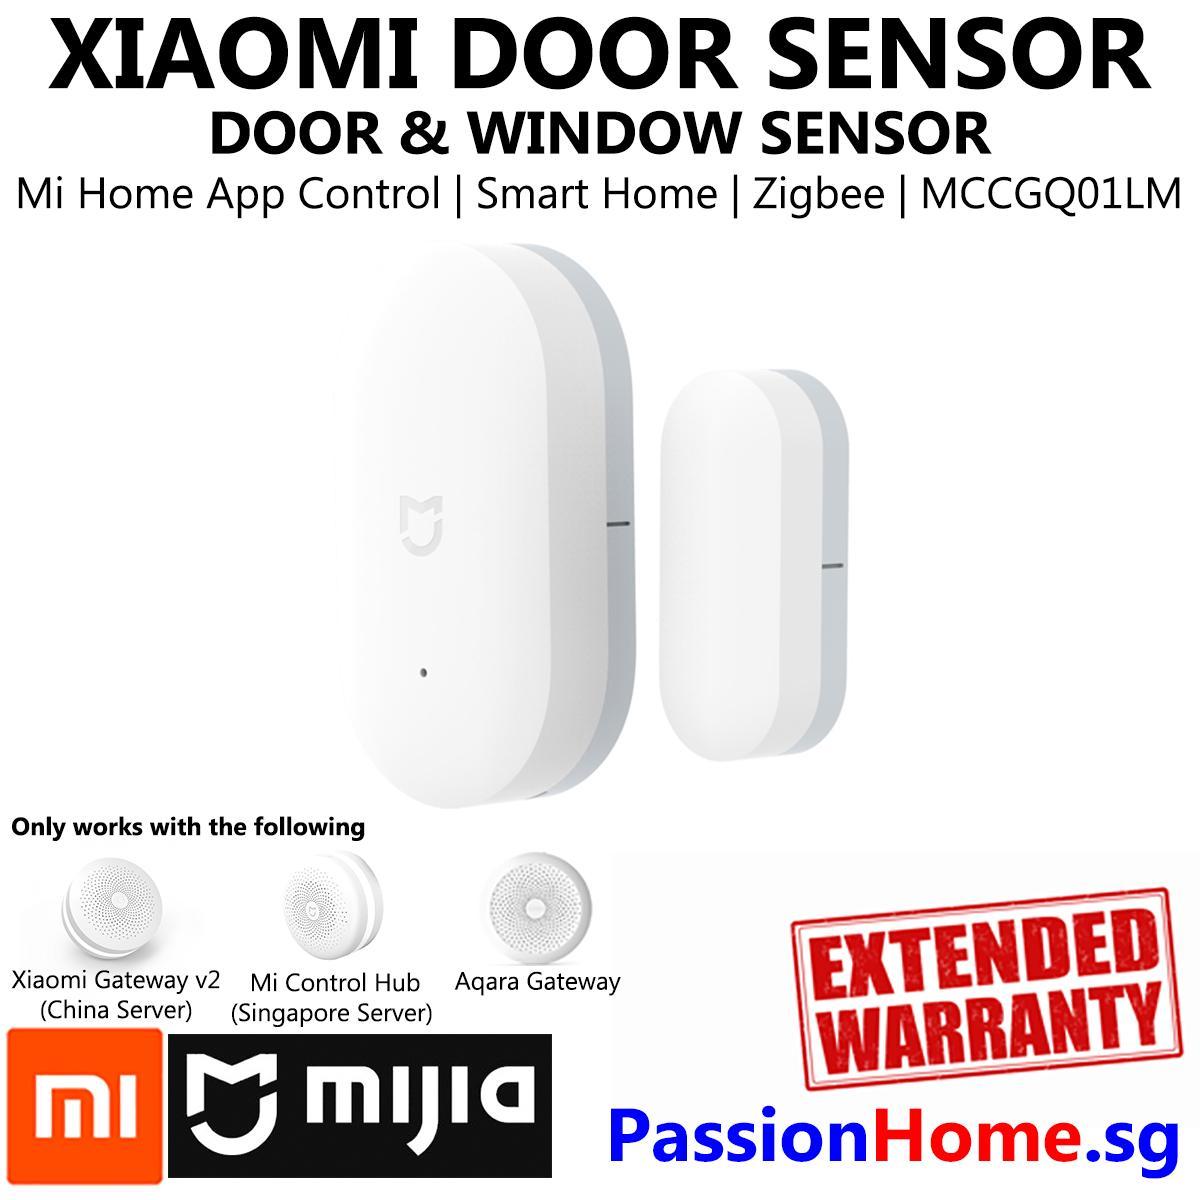 Xiaomi Window and Door Smart Sensor - Xiaomi Mijia Smart Home Automation -  Zigbee - (Works with Mi Home and Aqara Home App / HomeKit if used with